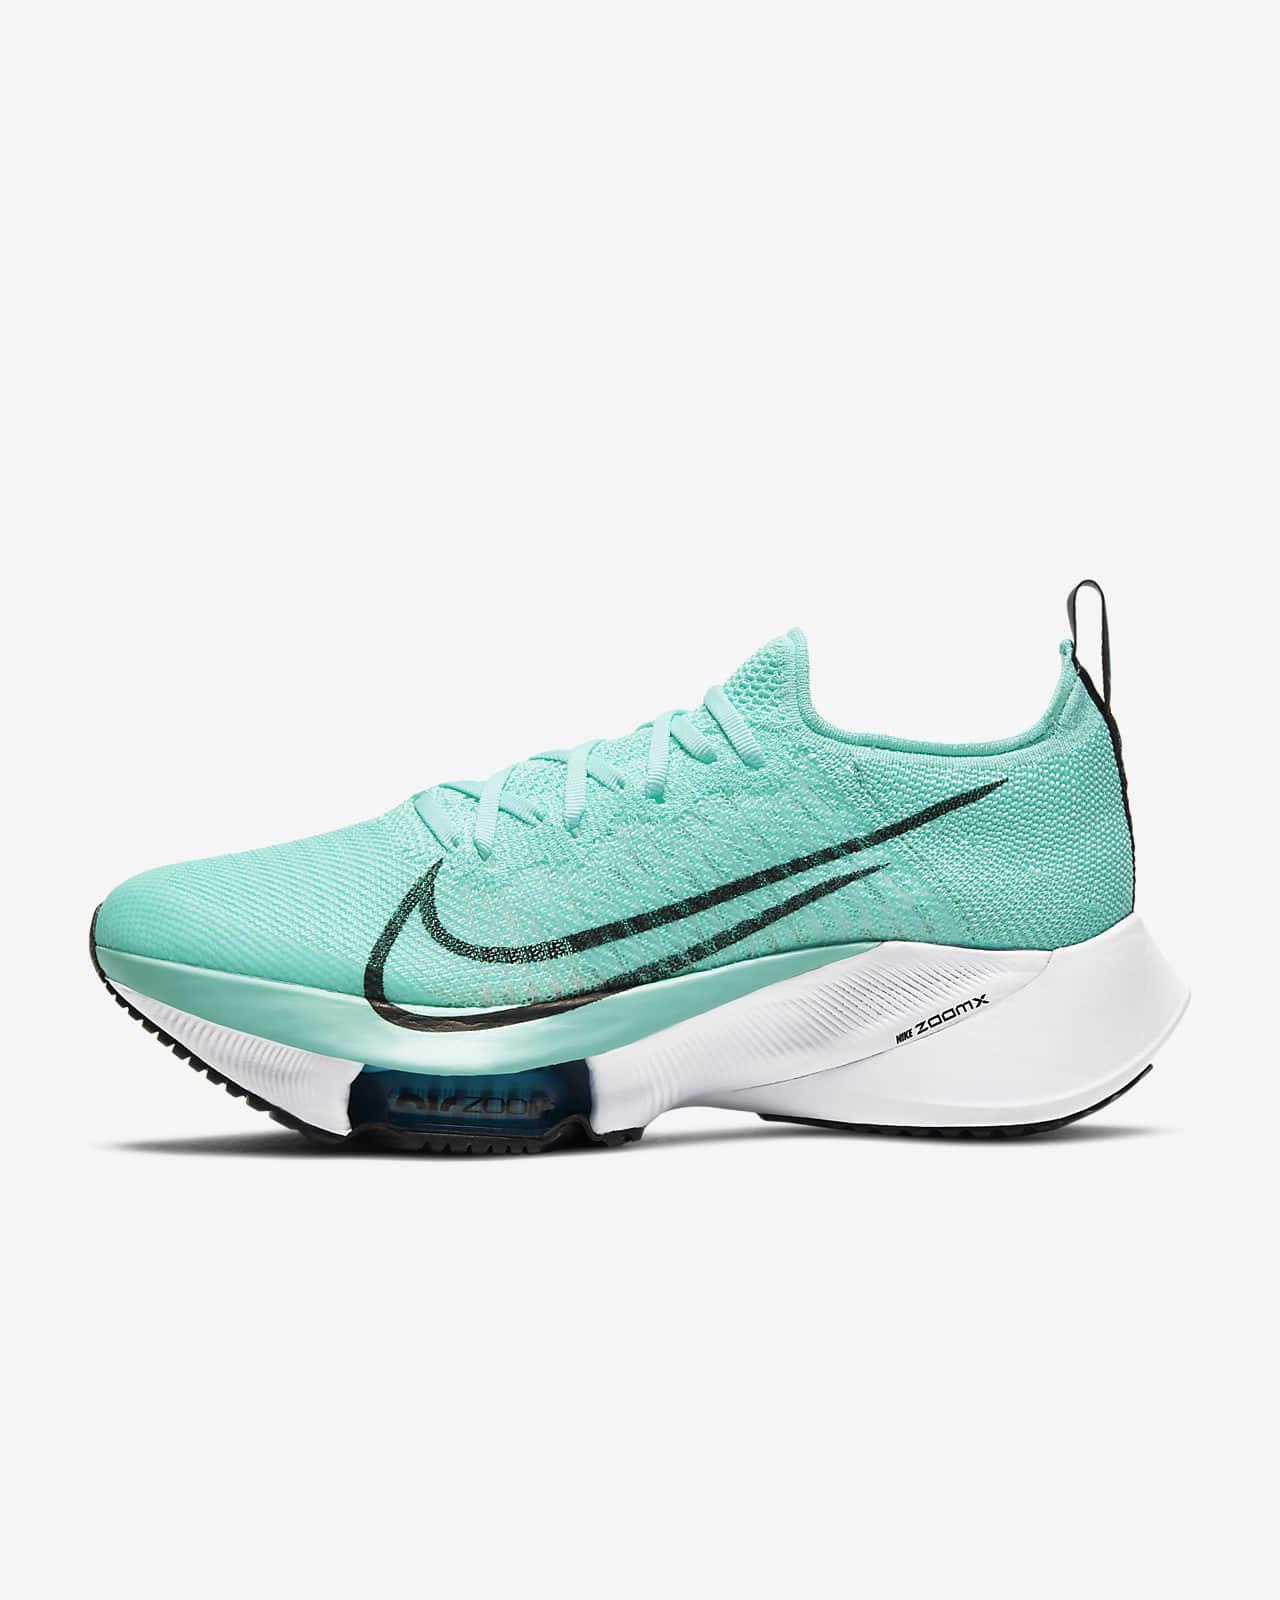 Calzado de running para mujer Nike Air Zoom Tempo NEXT%